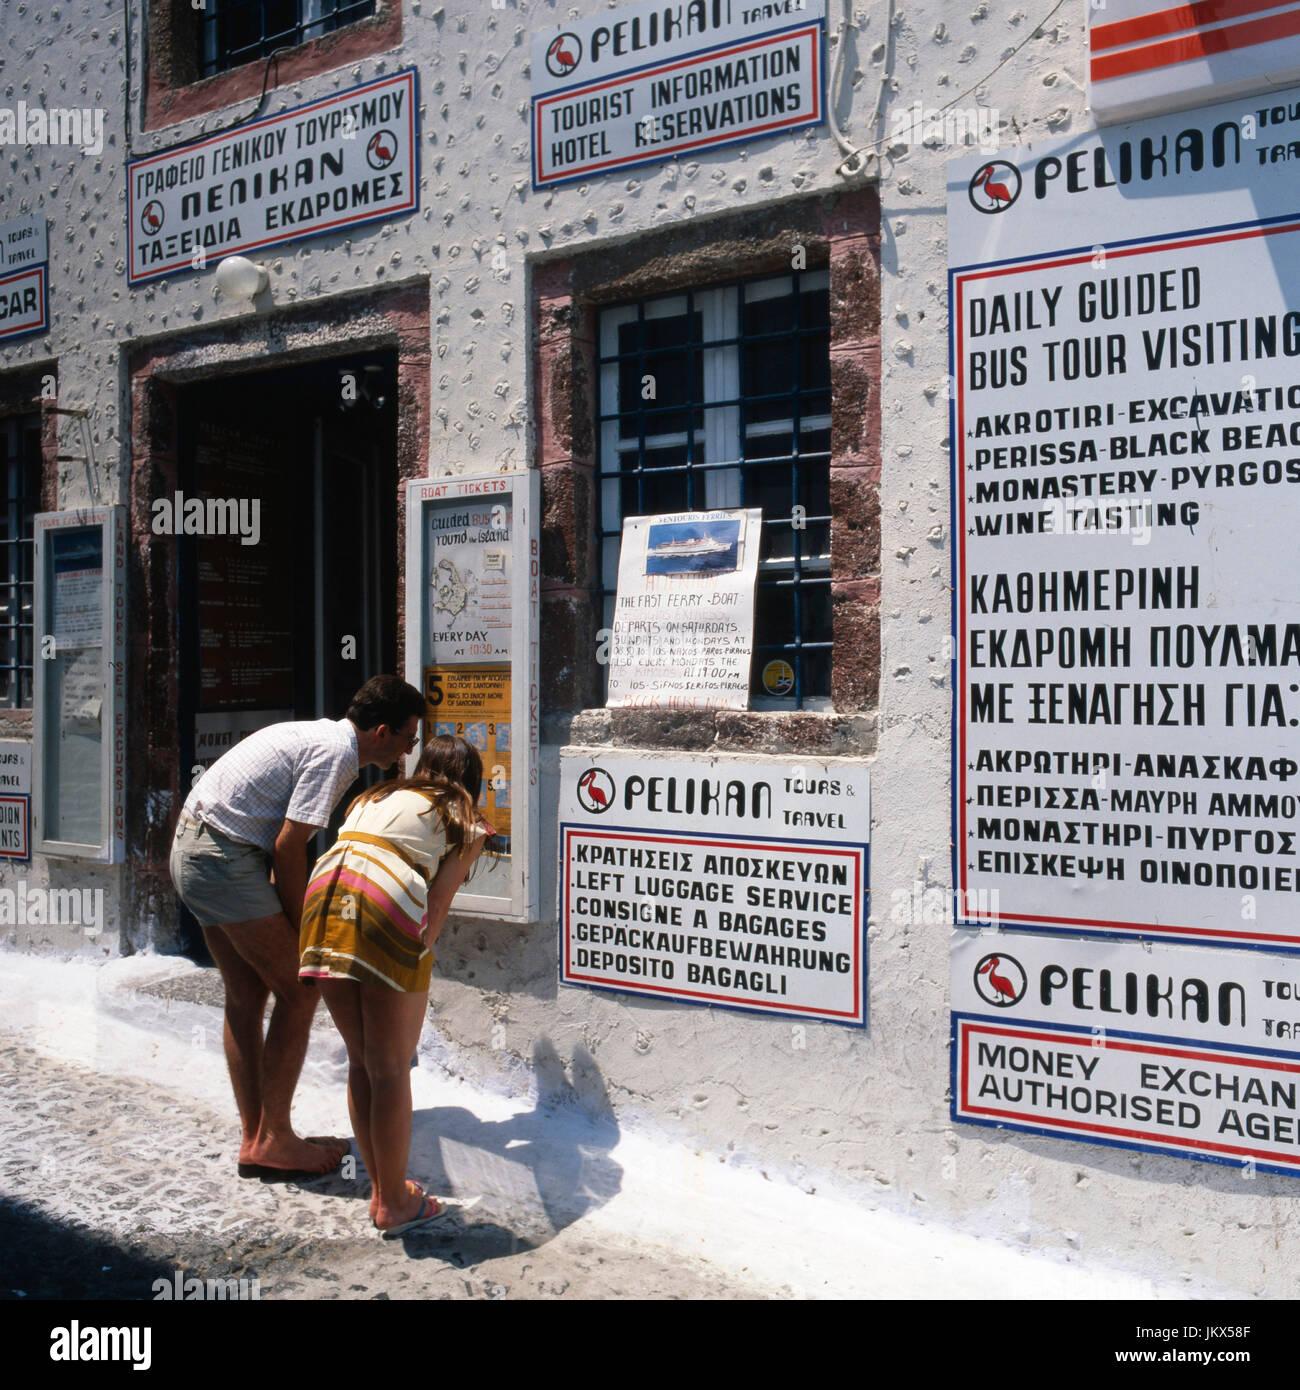 Thira auf Santorin, Griechenland 1990er. Thira on Santorini, Greece 1990s. - Stock Image